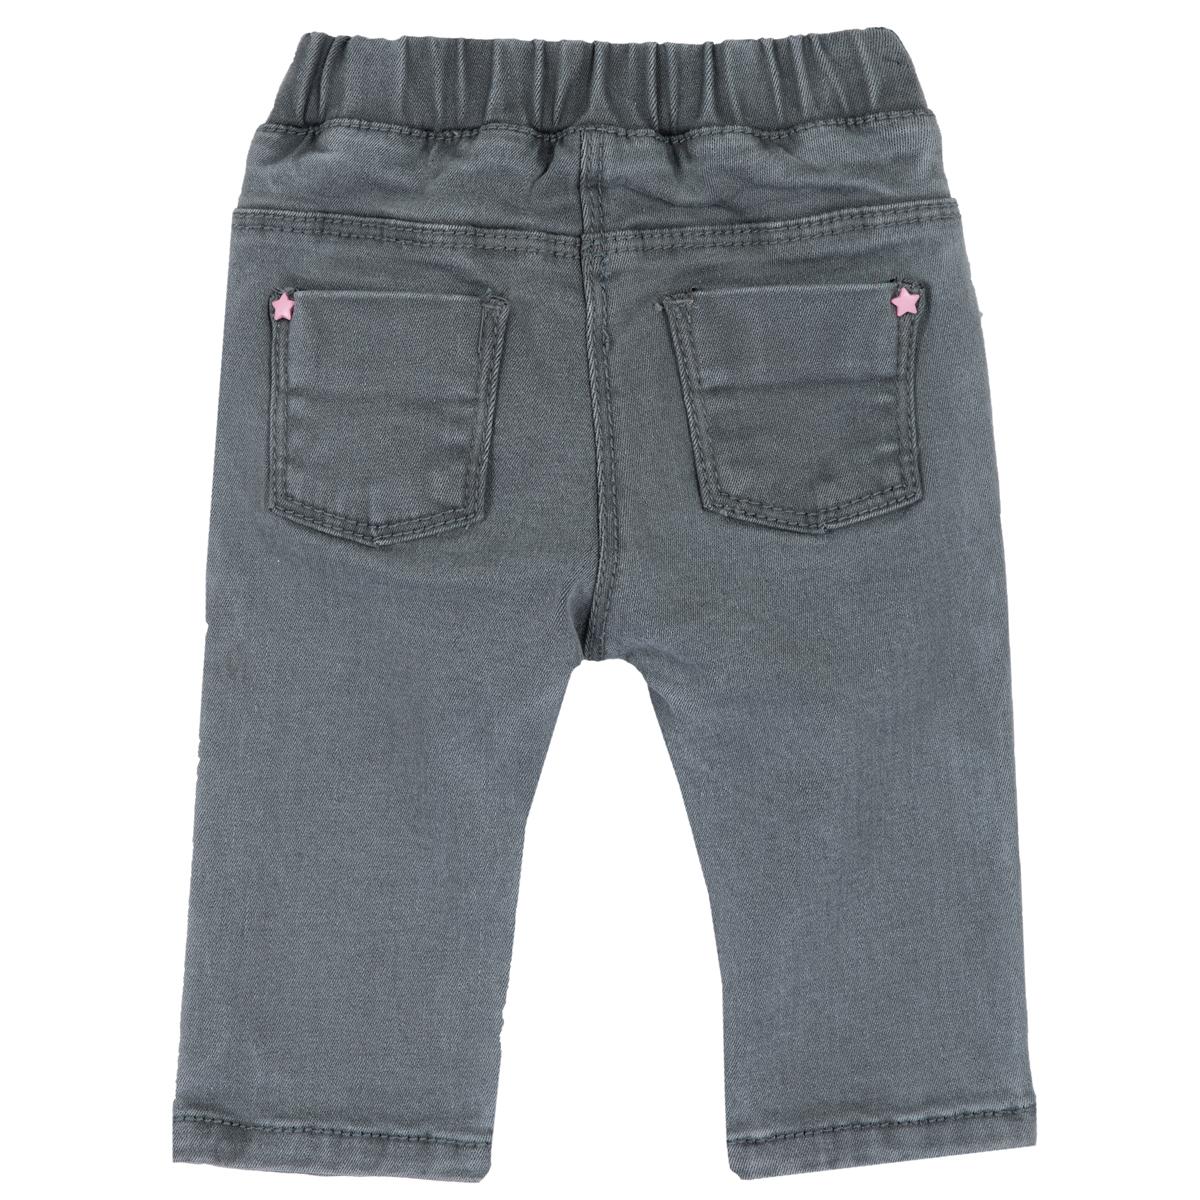 Pantaloni lungi copii Chicco, denim elastic, gri, 24997 din categoria Pantaloni copii